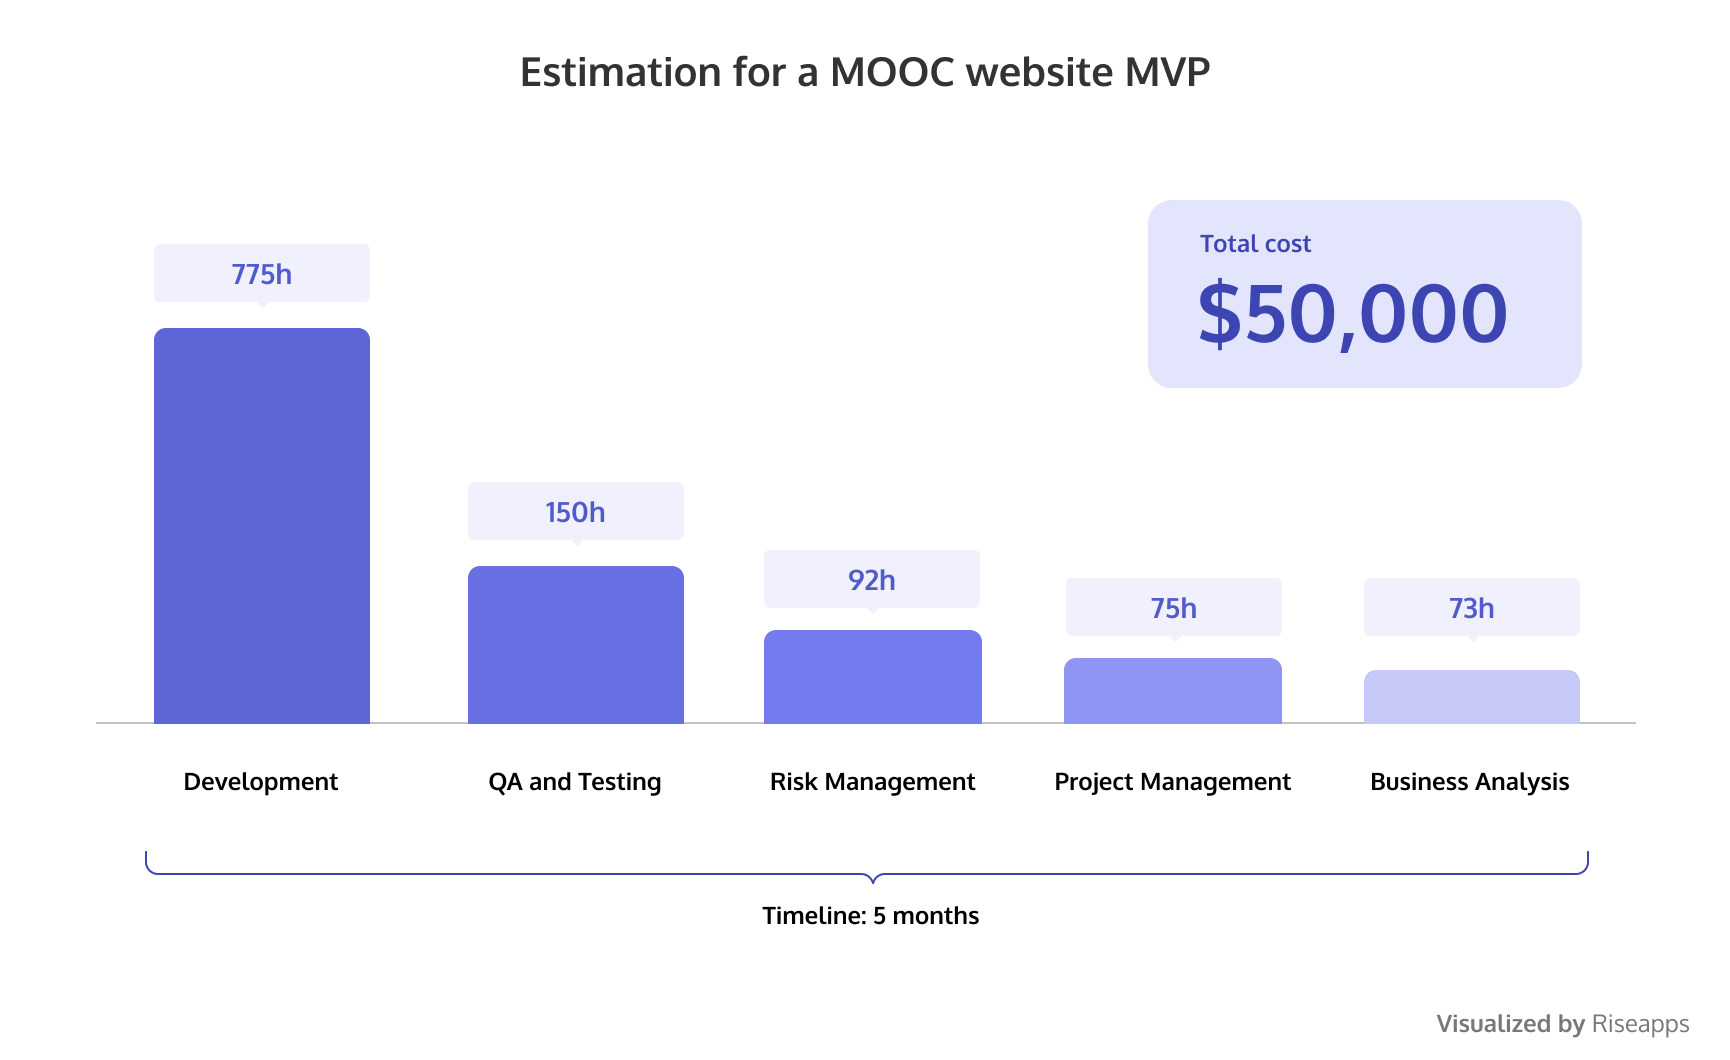 Estimation for a MOOC website MVP